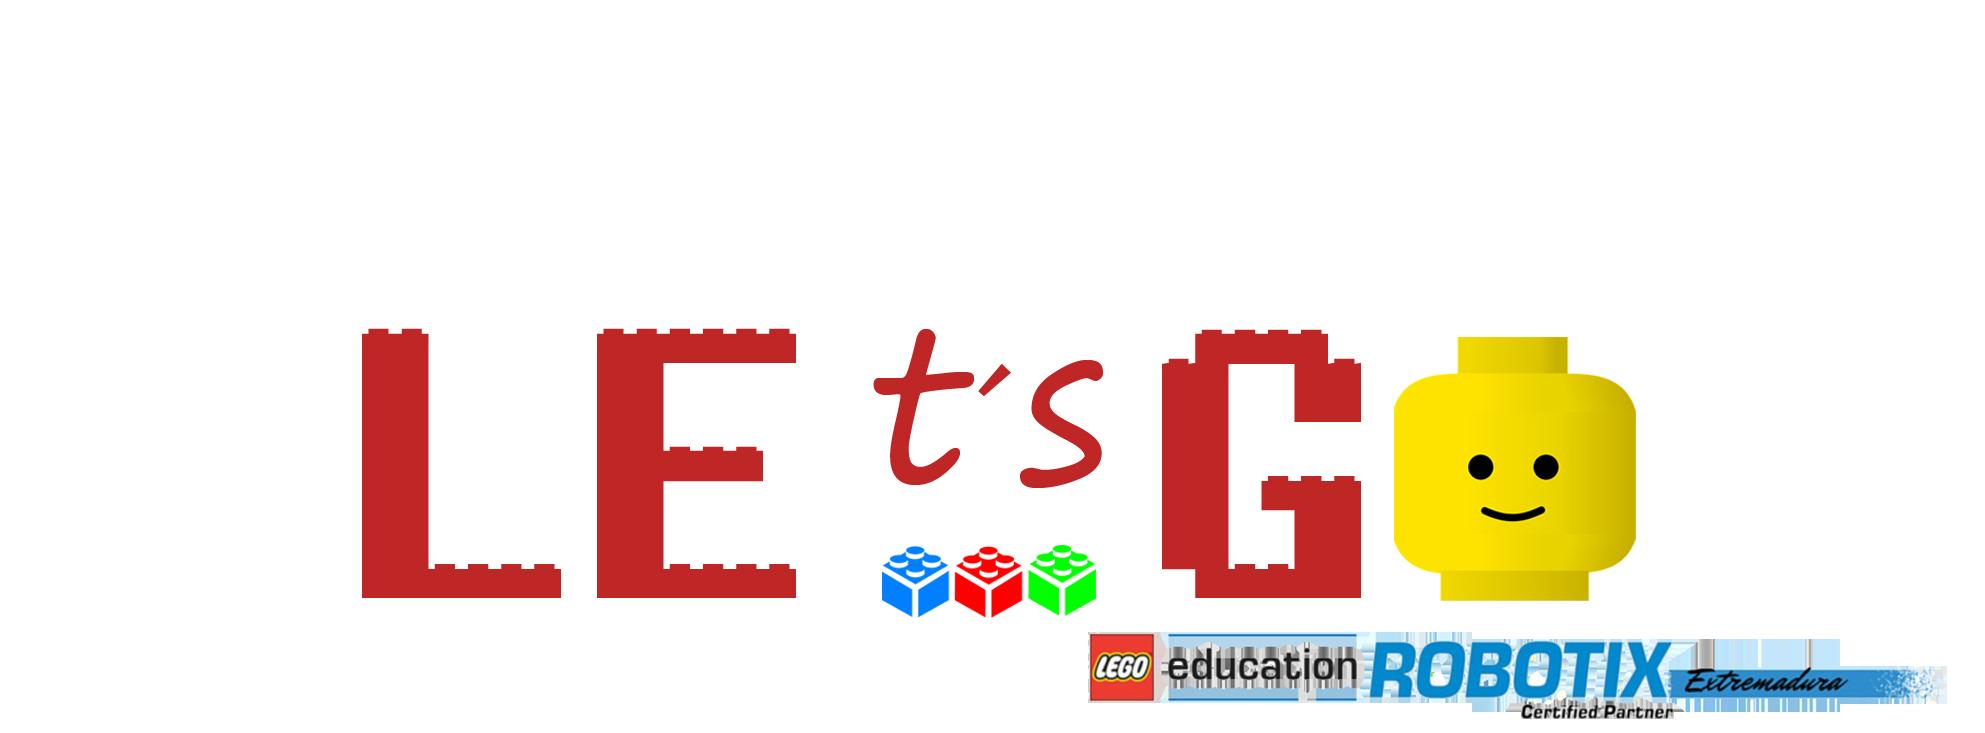 Lego Robotix Extremadura